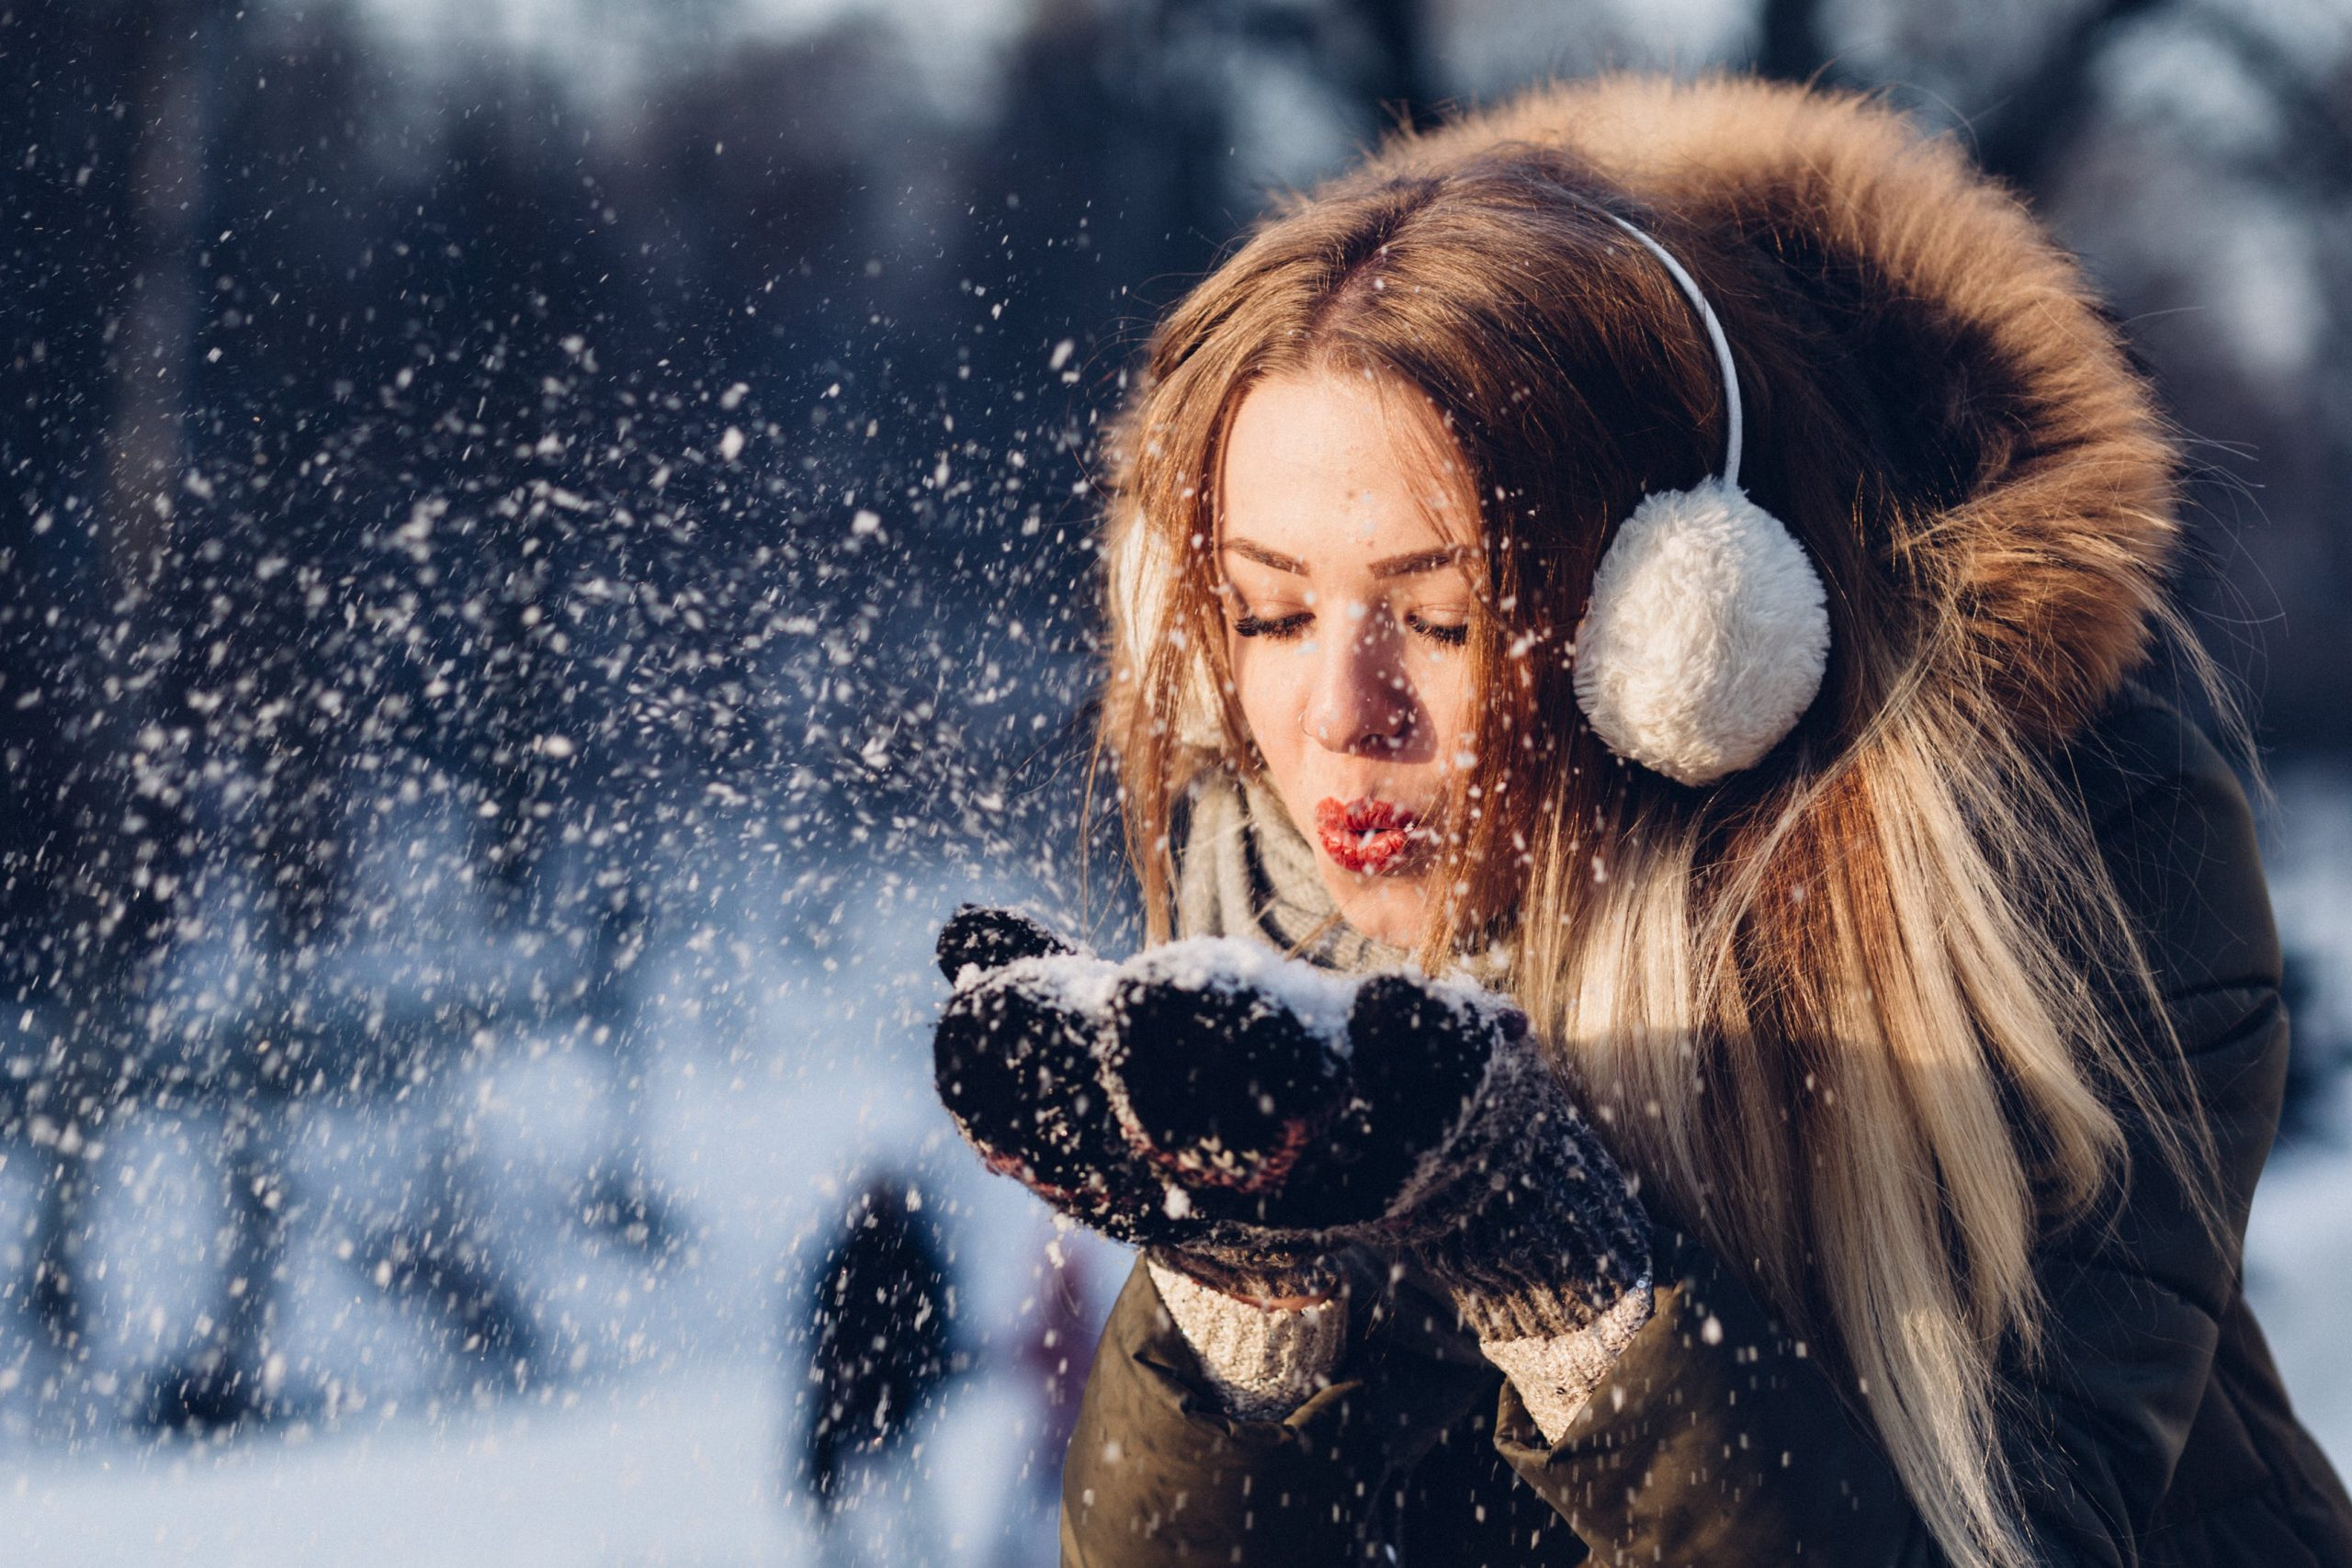 Horoskop za zimu: Svemir nam sprema drastične promjene!